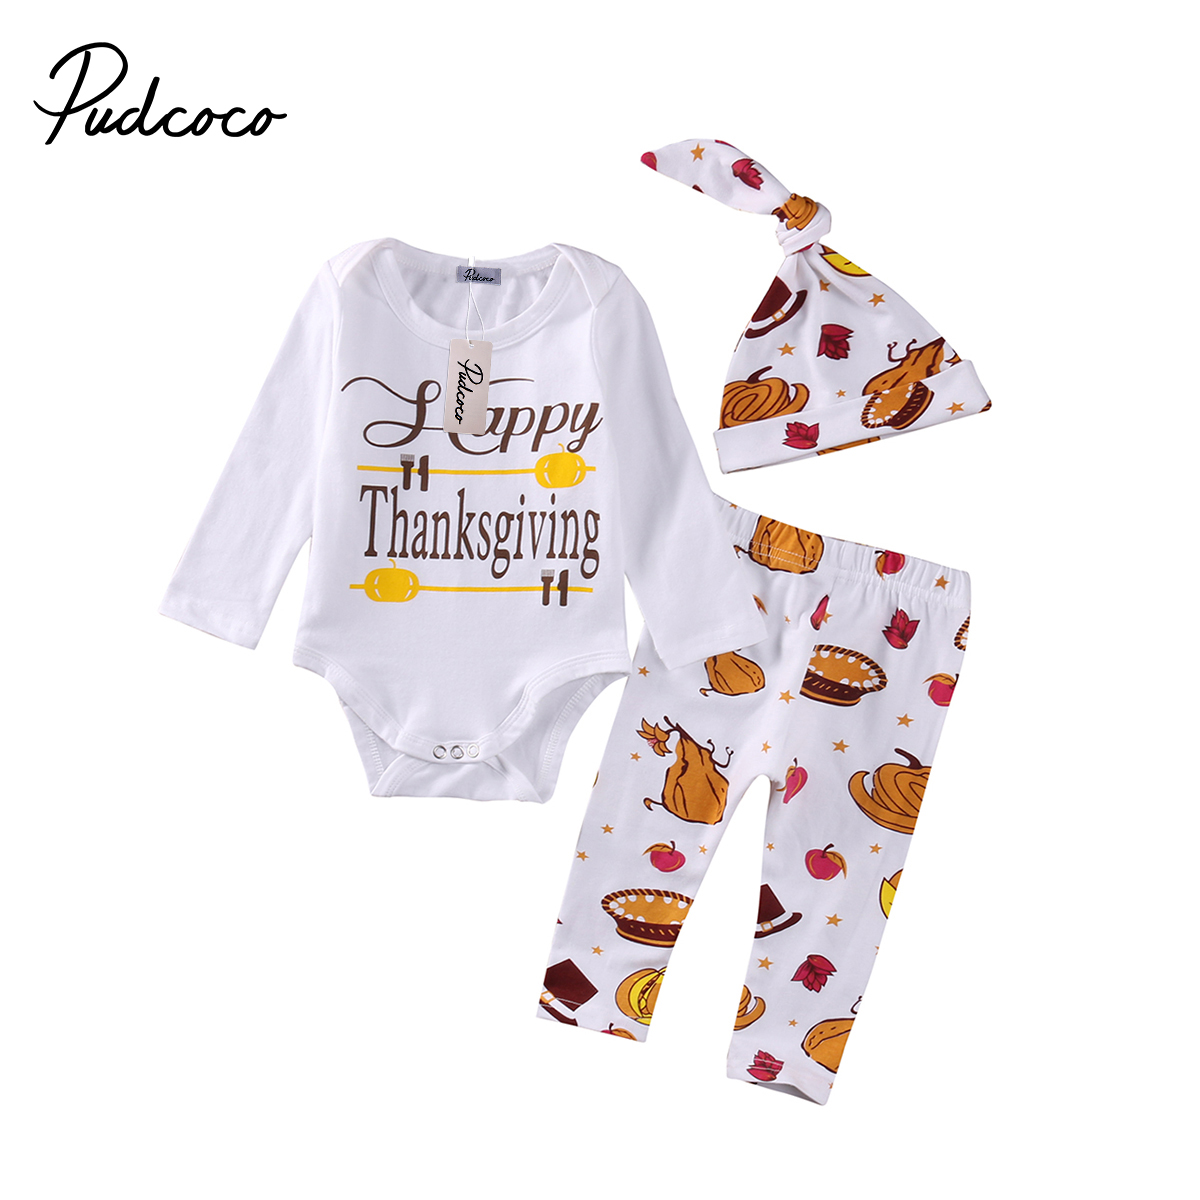 Pudcoco 3PCS Newborn Baby Boys Girls Clothes Long Sleeve O-Neck Bodysuit Pants Leggings Hat Outfits Set 0-18 Months Helen115